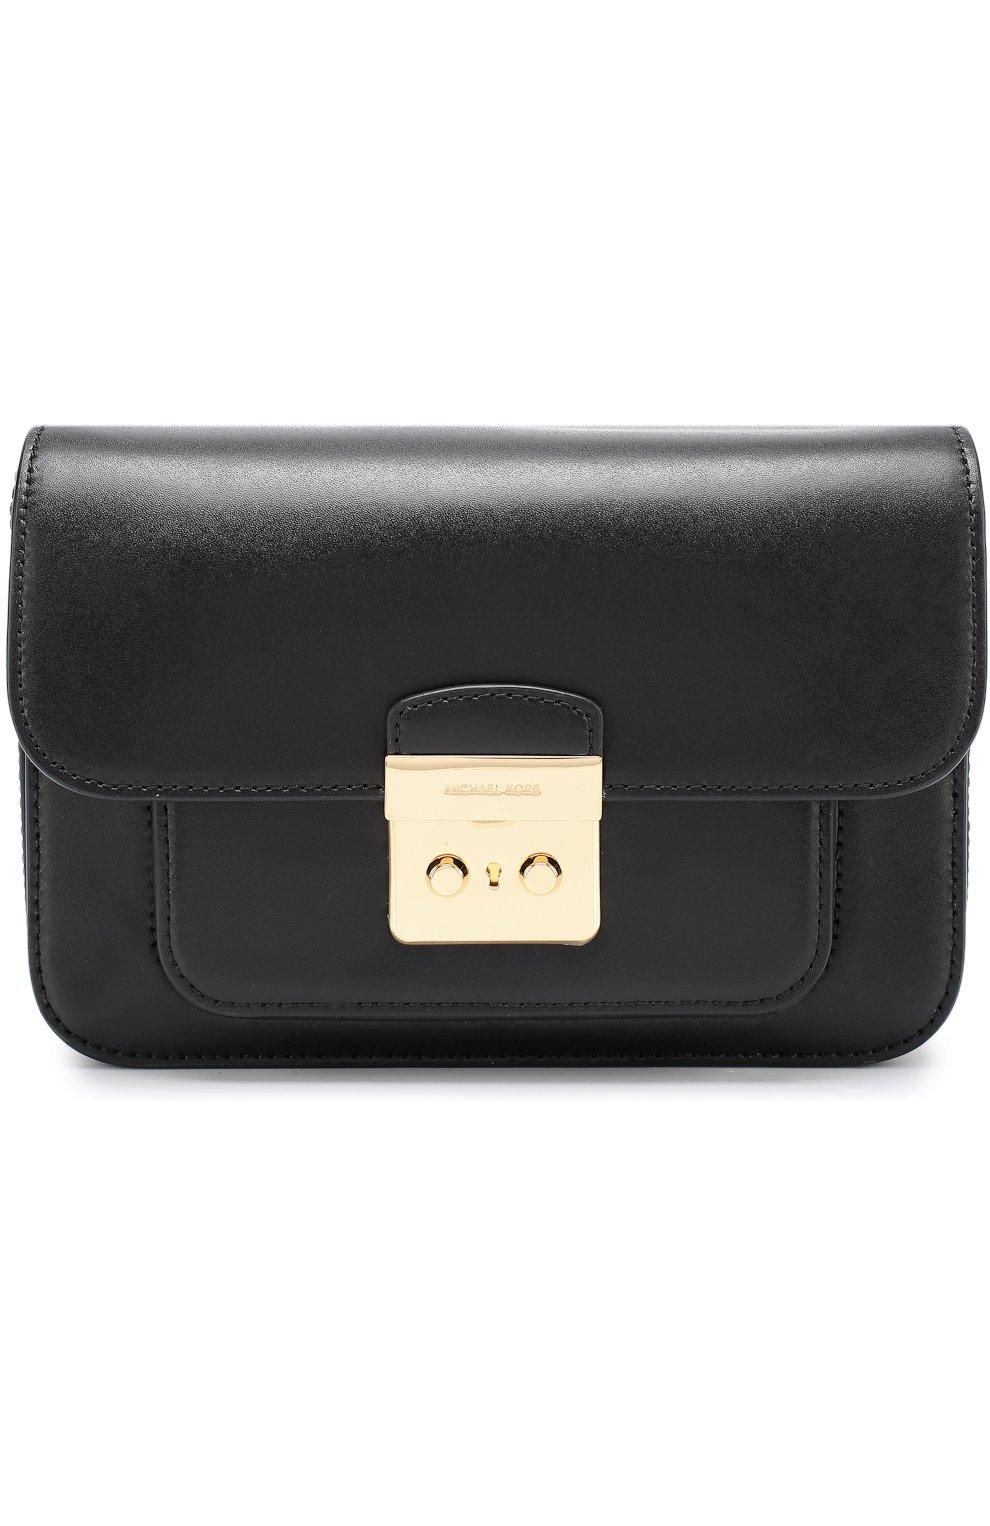 0be8c6d658a0 Женская черного сумка sloan editor MICHAEL MICHAEL KORS Китай 5177250  30T7GS9L3L - купить - Цена В Рублях